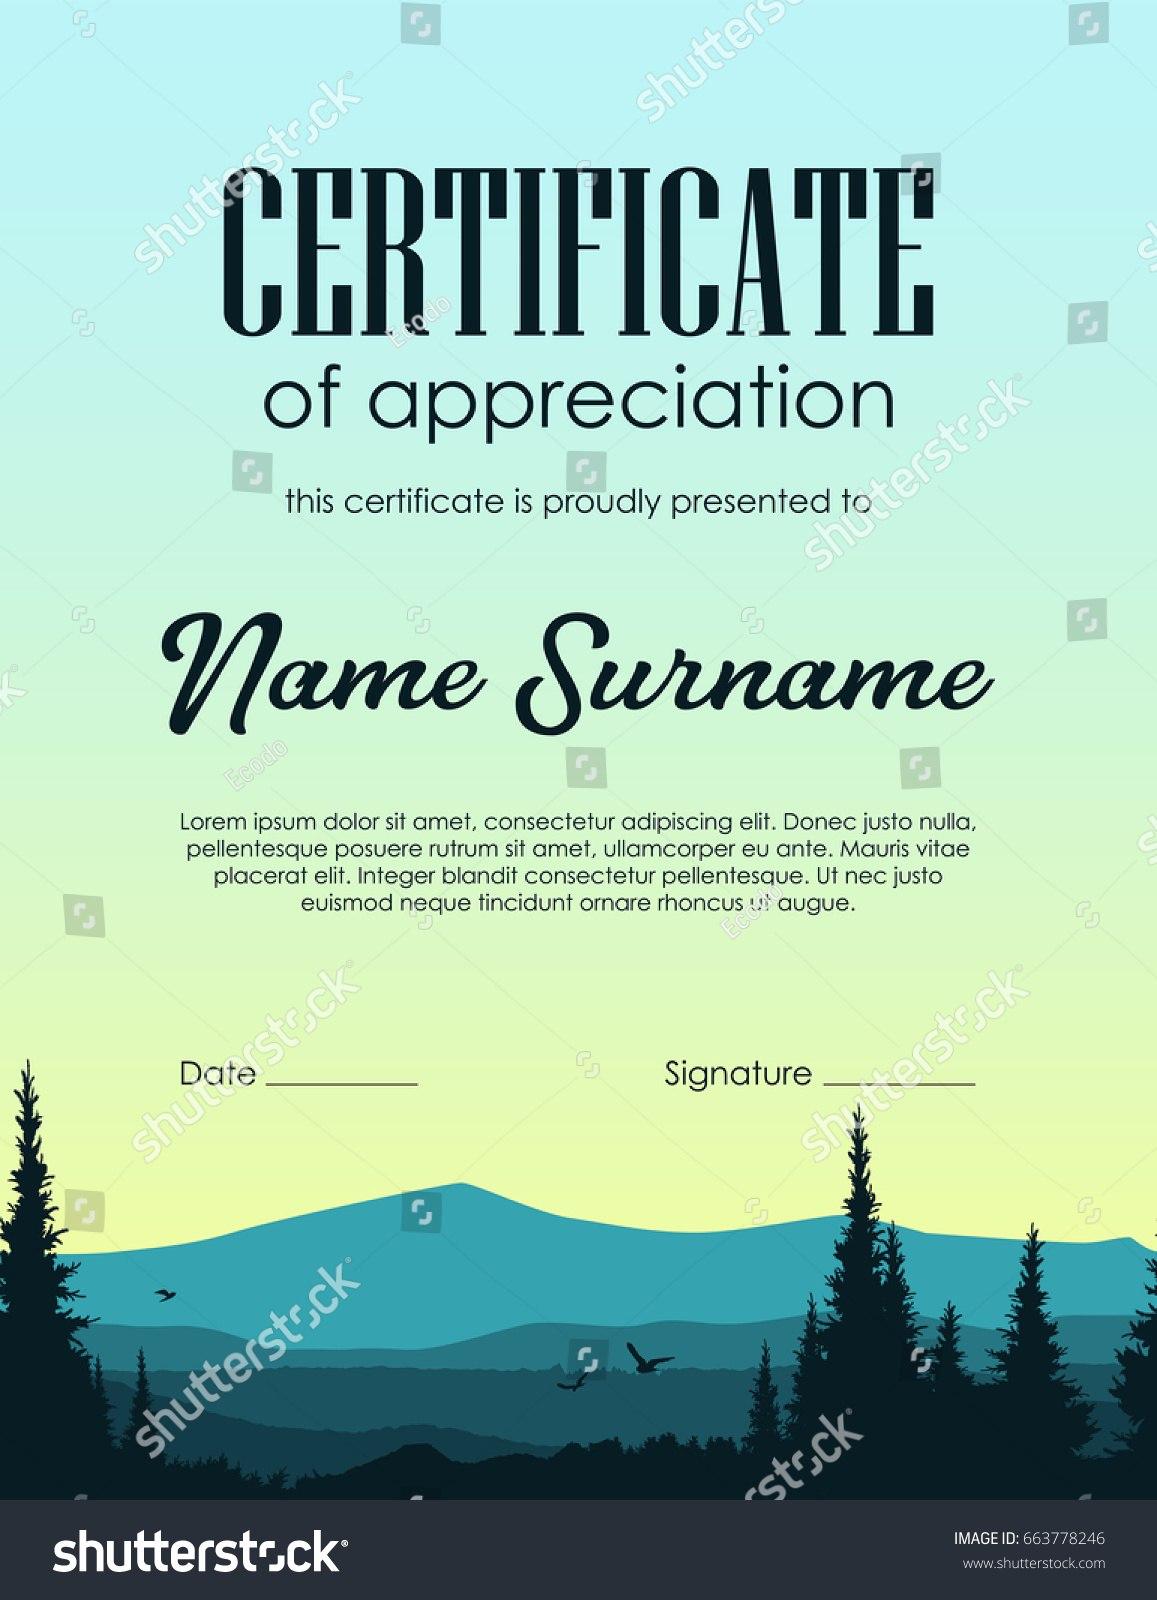 Certificate Template Forest Landscape Background Stock Vector With Landscape Certificate Templates